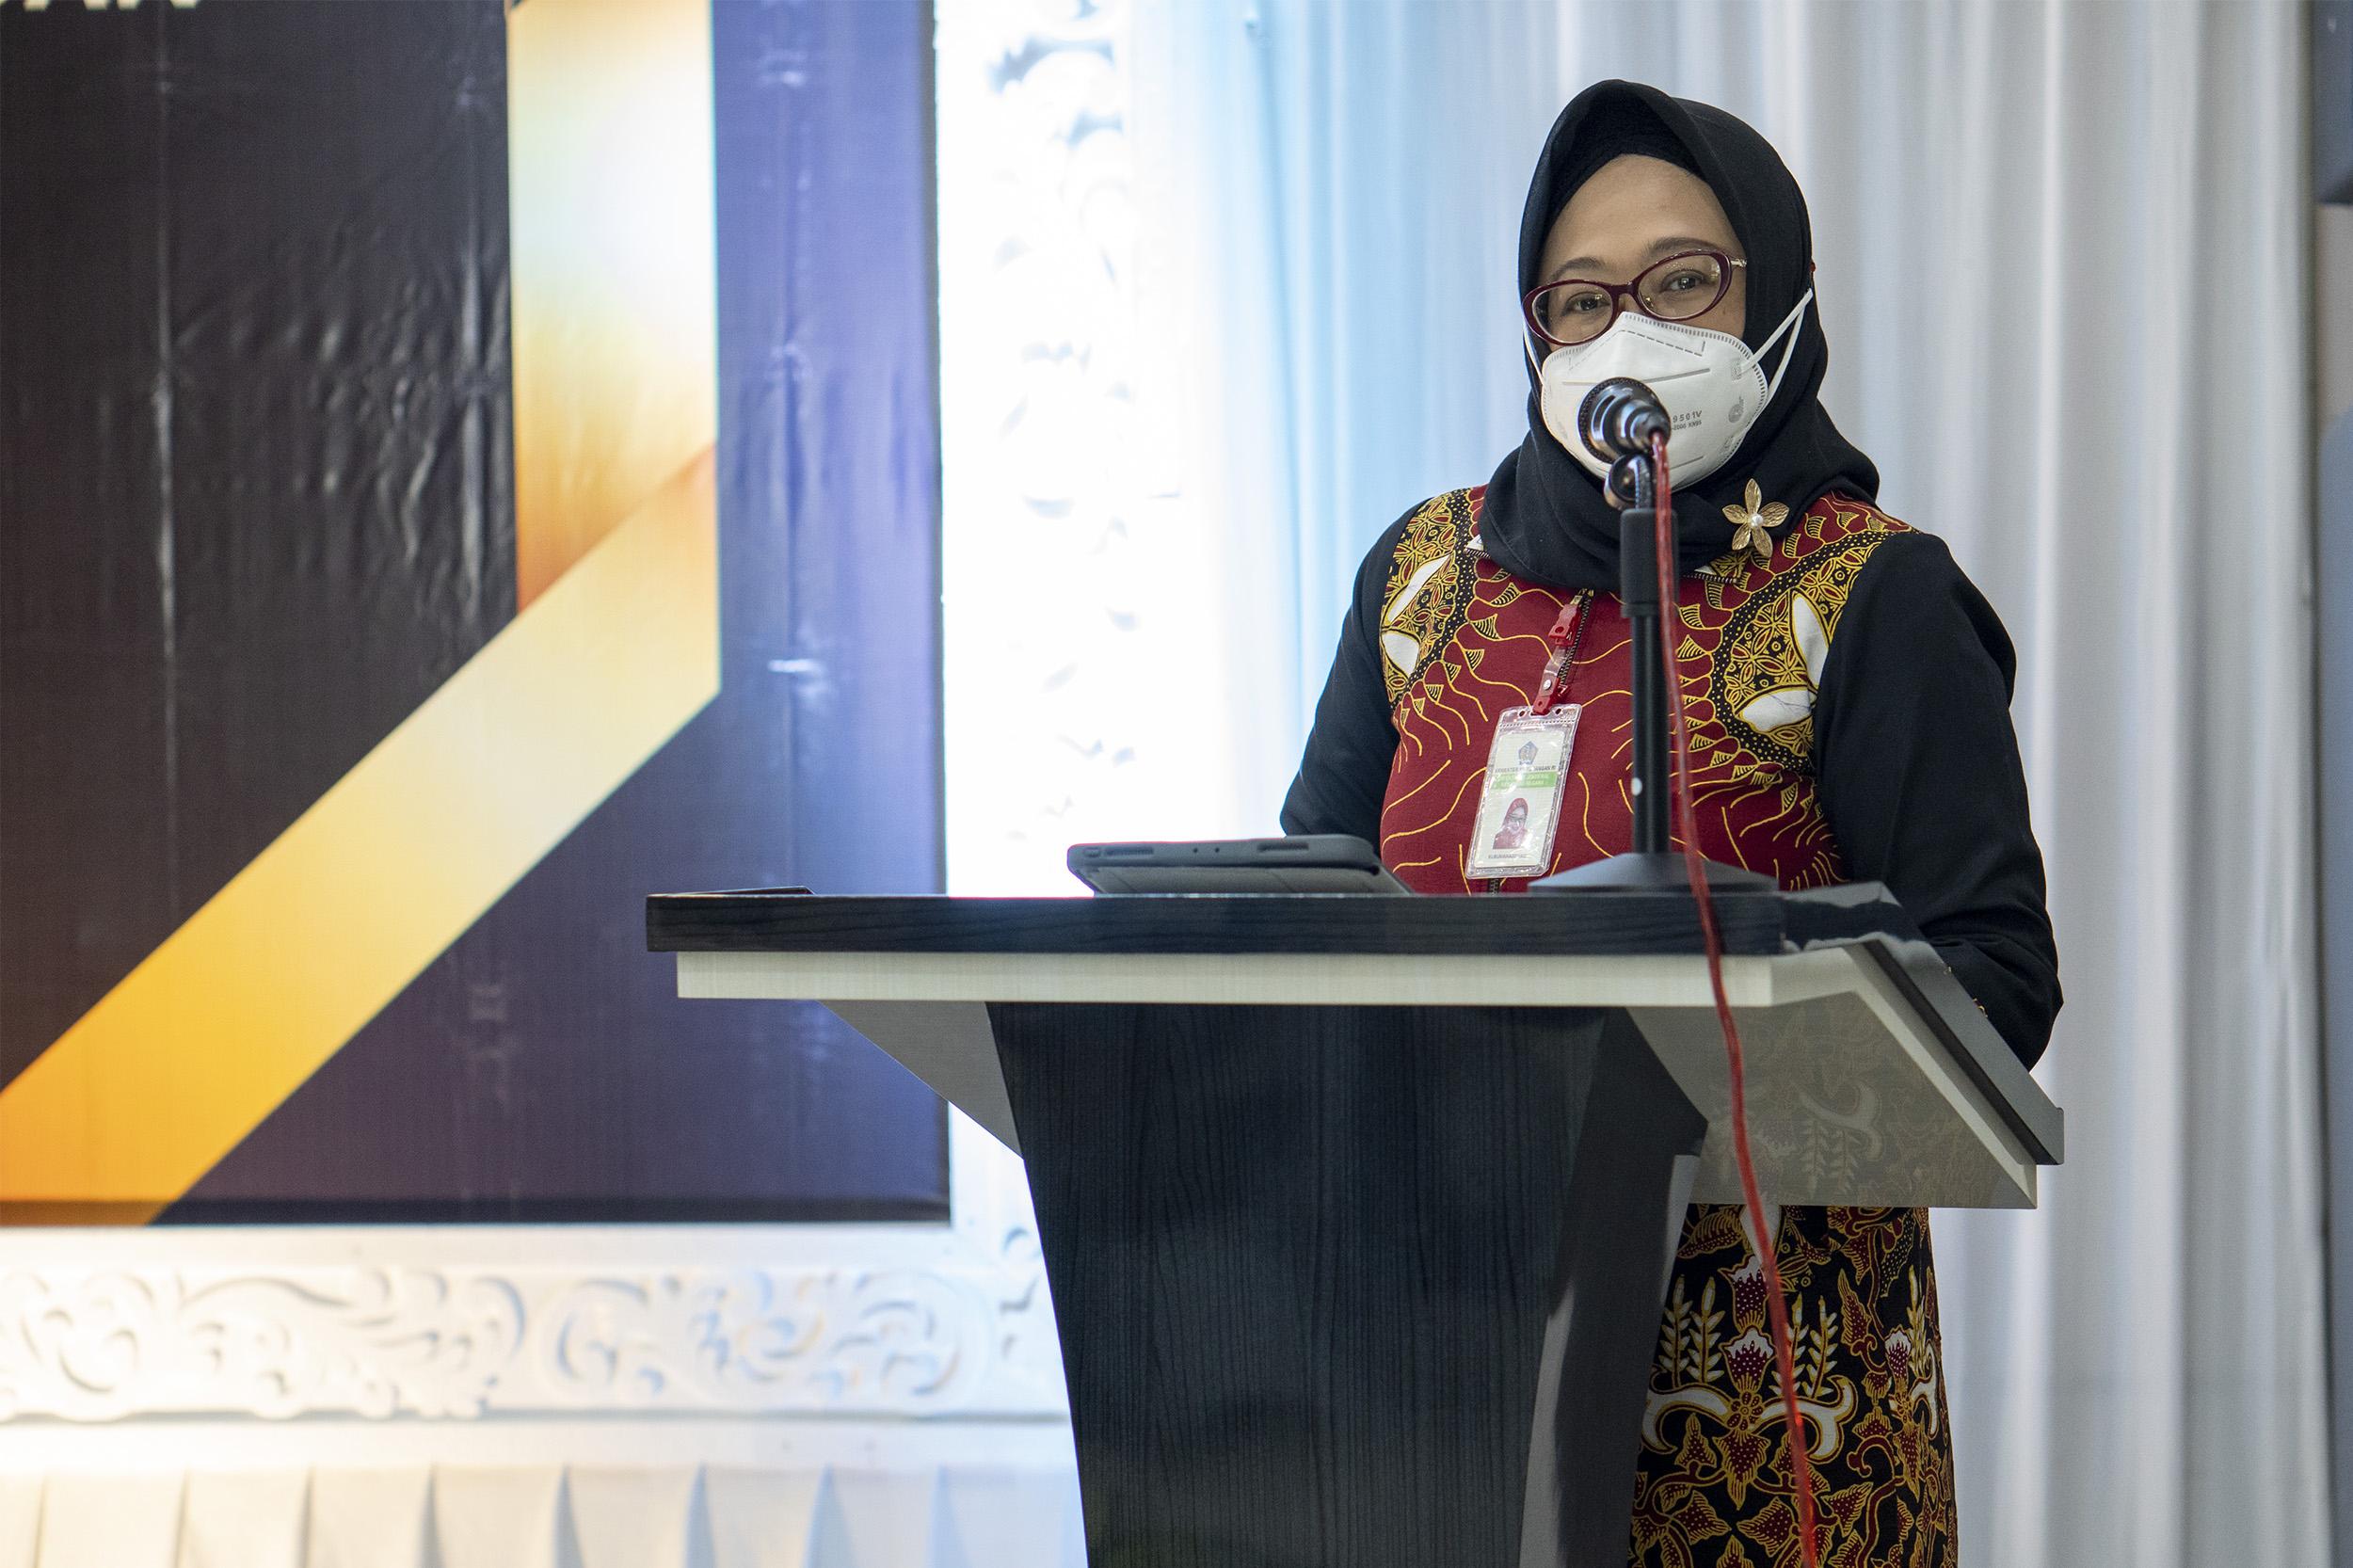 Kusumawardhani Hadiri Acara Sosialisasi Pengelolaan Kekayaan Negara dan Penganugerahan Apresiasi di KPKNL Tarakan